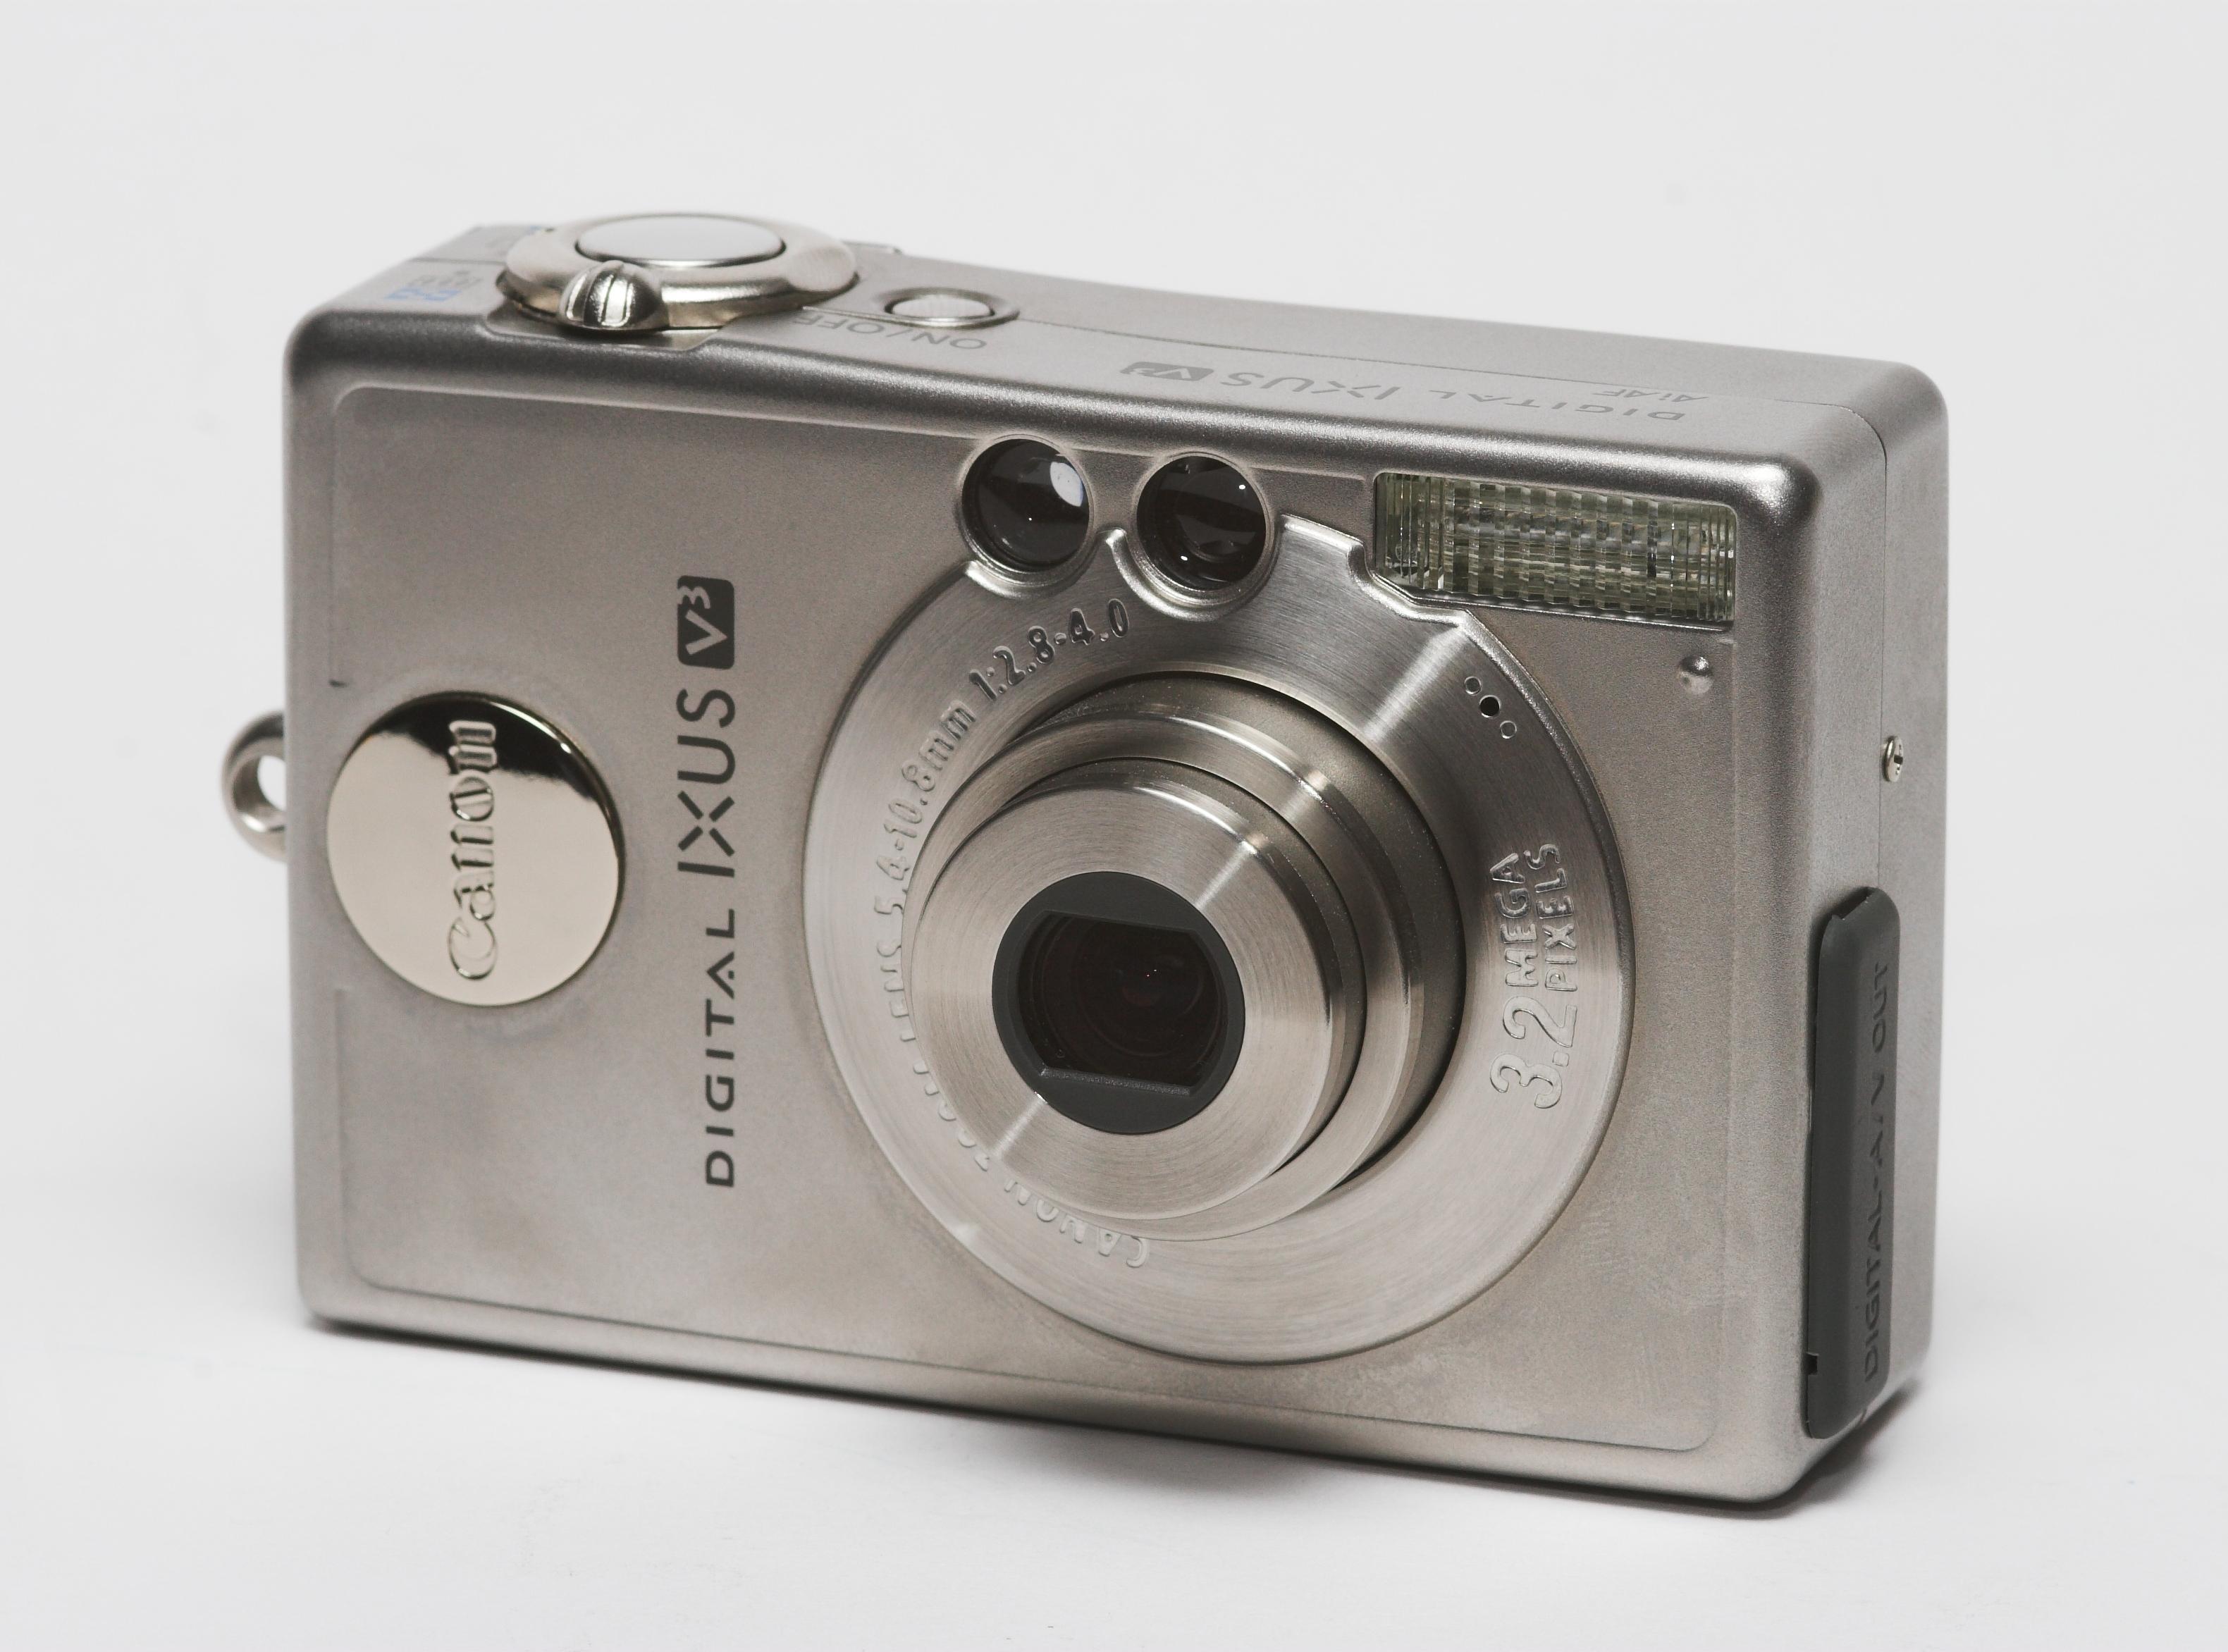 File:Canon Digital Ixus V3.jpg